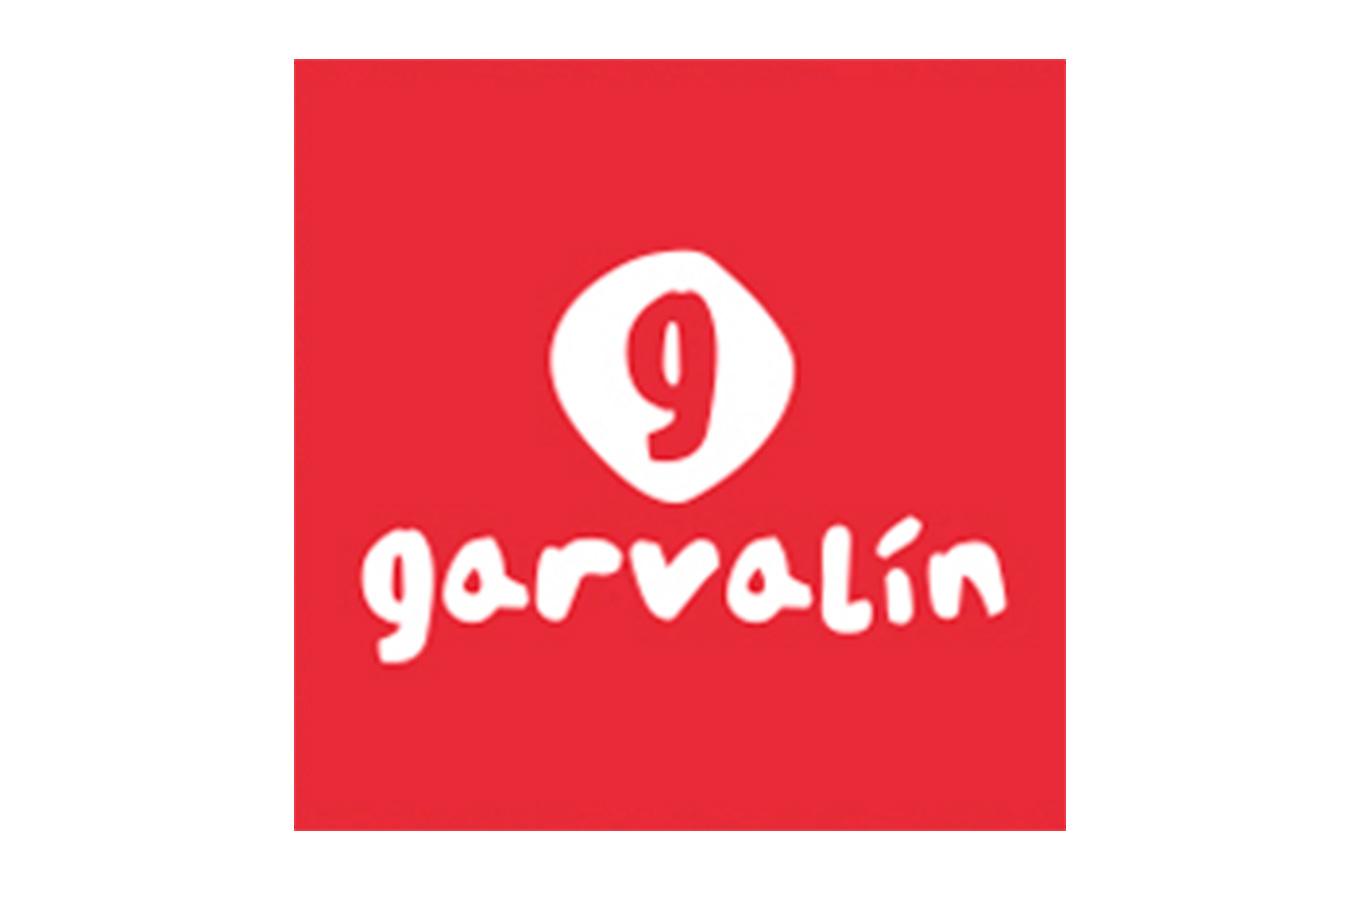 Gavalin